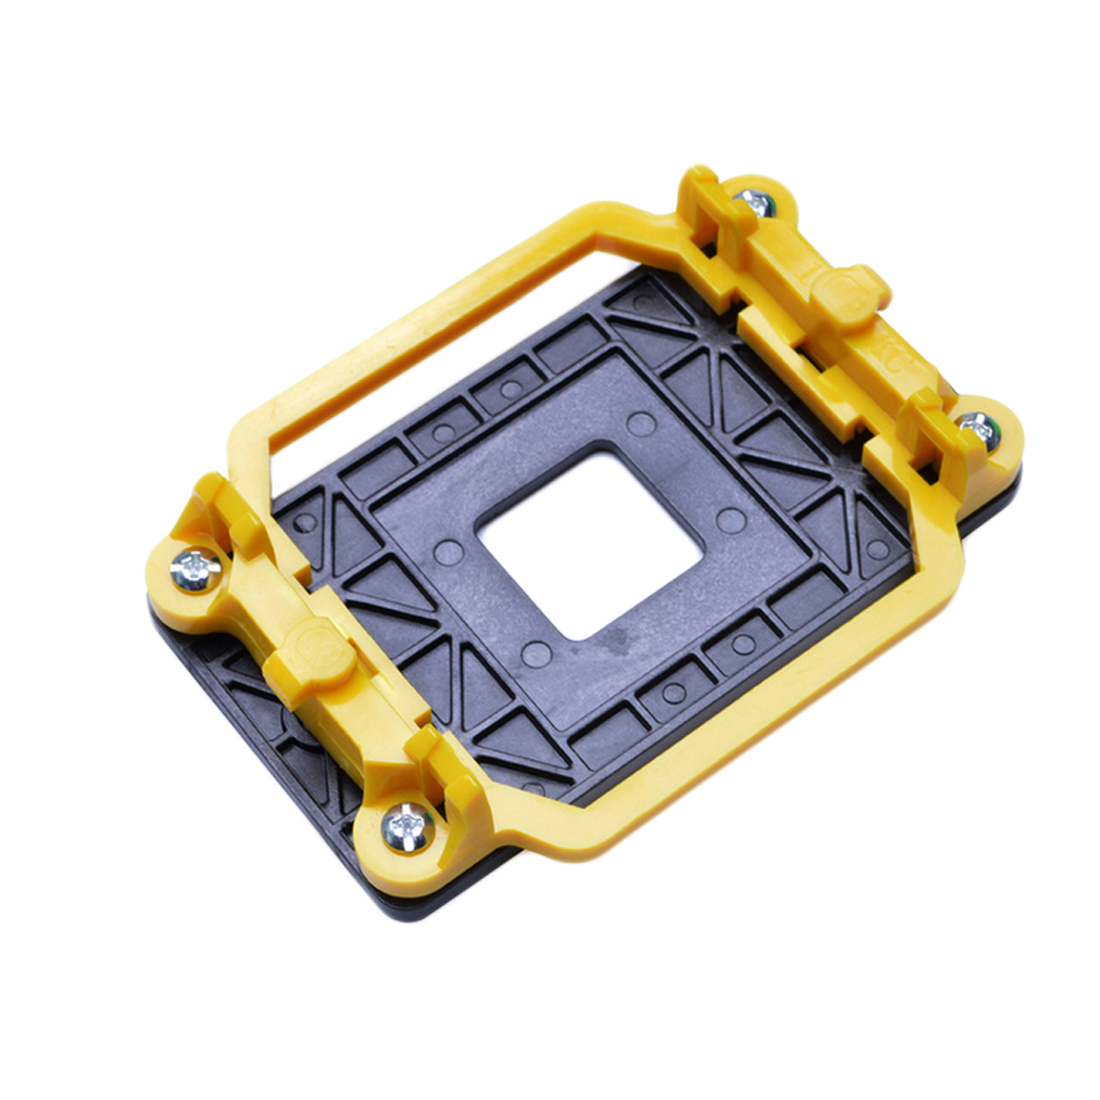 NOYOKERE Useful CPU Cooler Bracket Motherboard For AMD AM2/AM2+/AM3/AM3+/FM1/FM2/FM2+/940/939 Install The Fastening